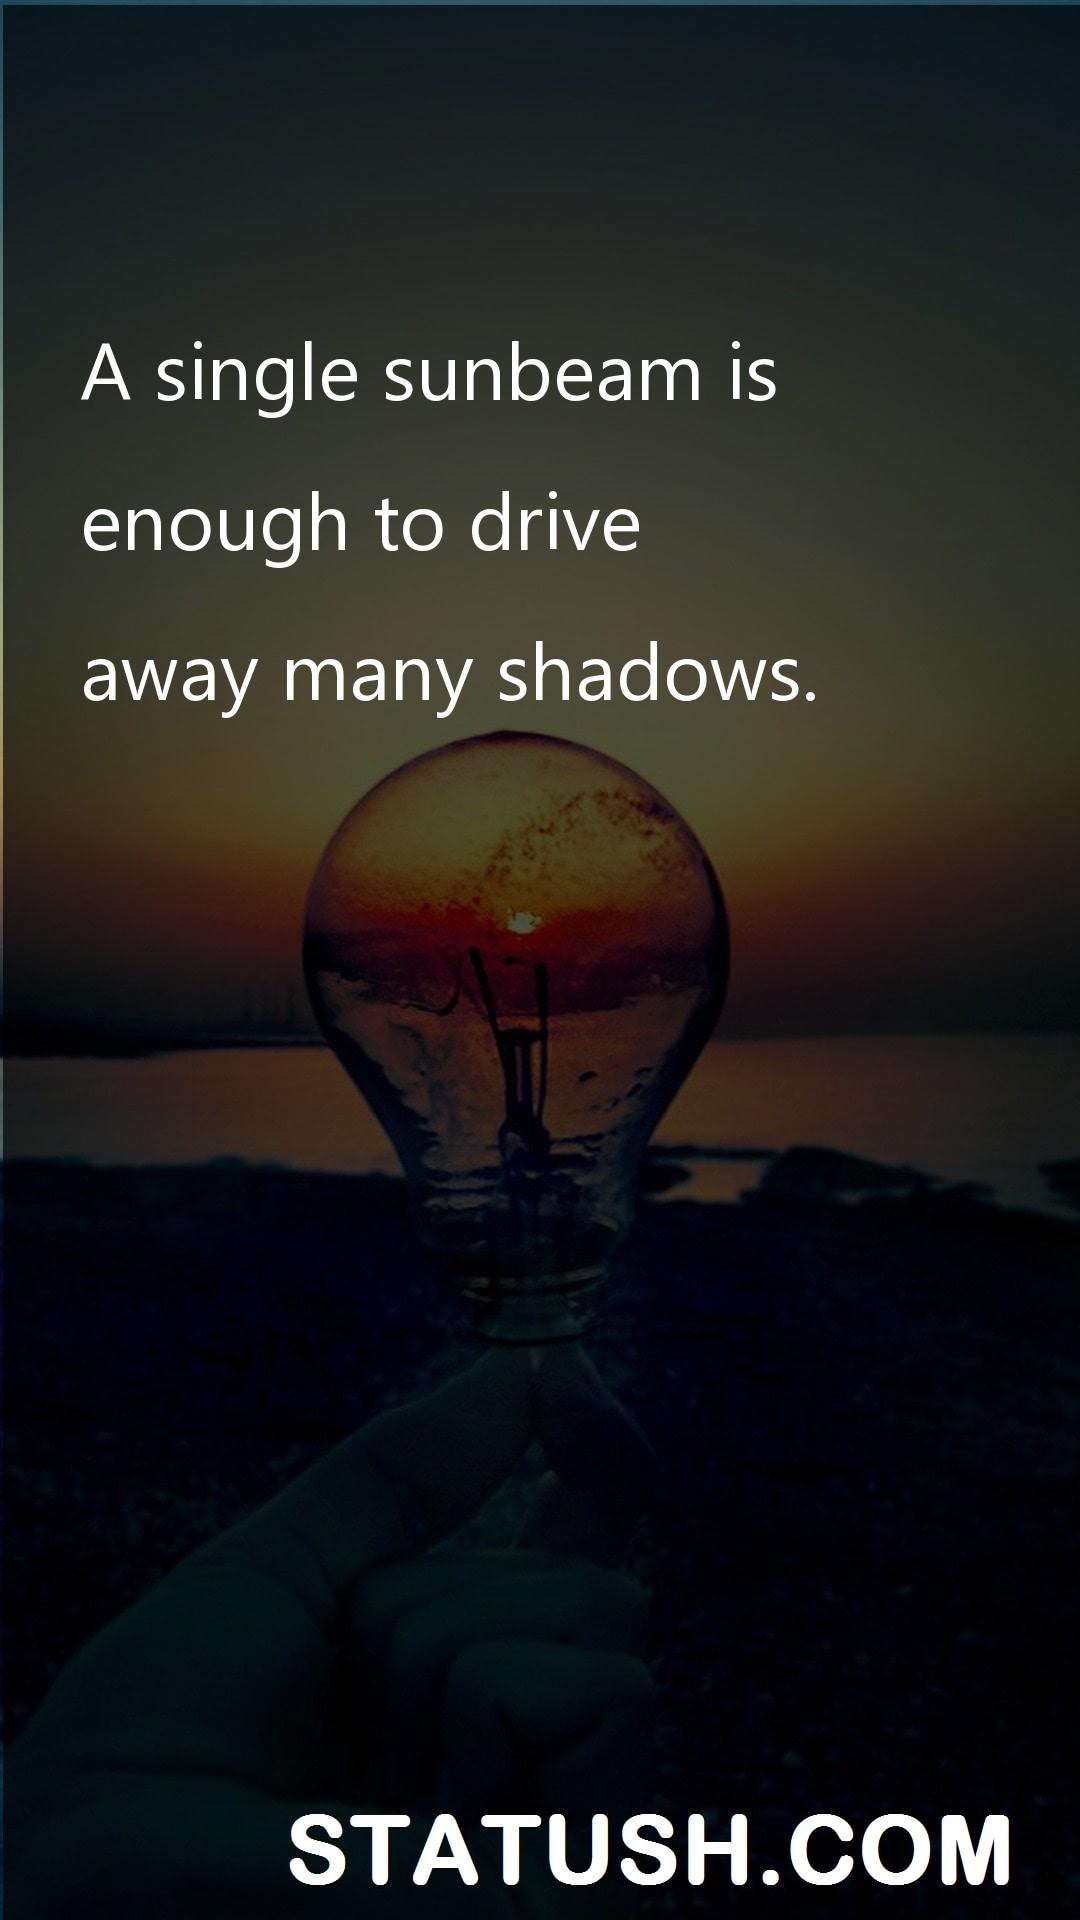 A single sunbeam is